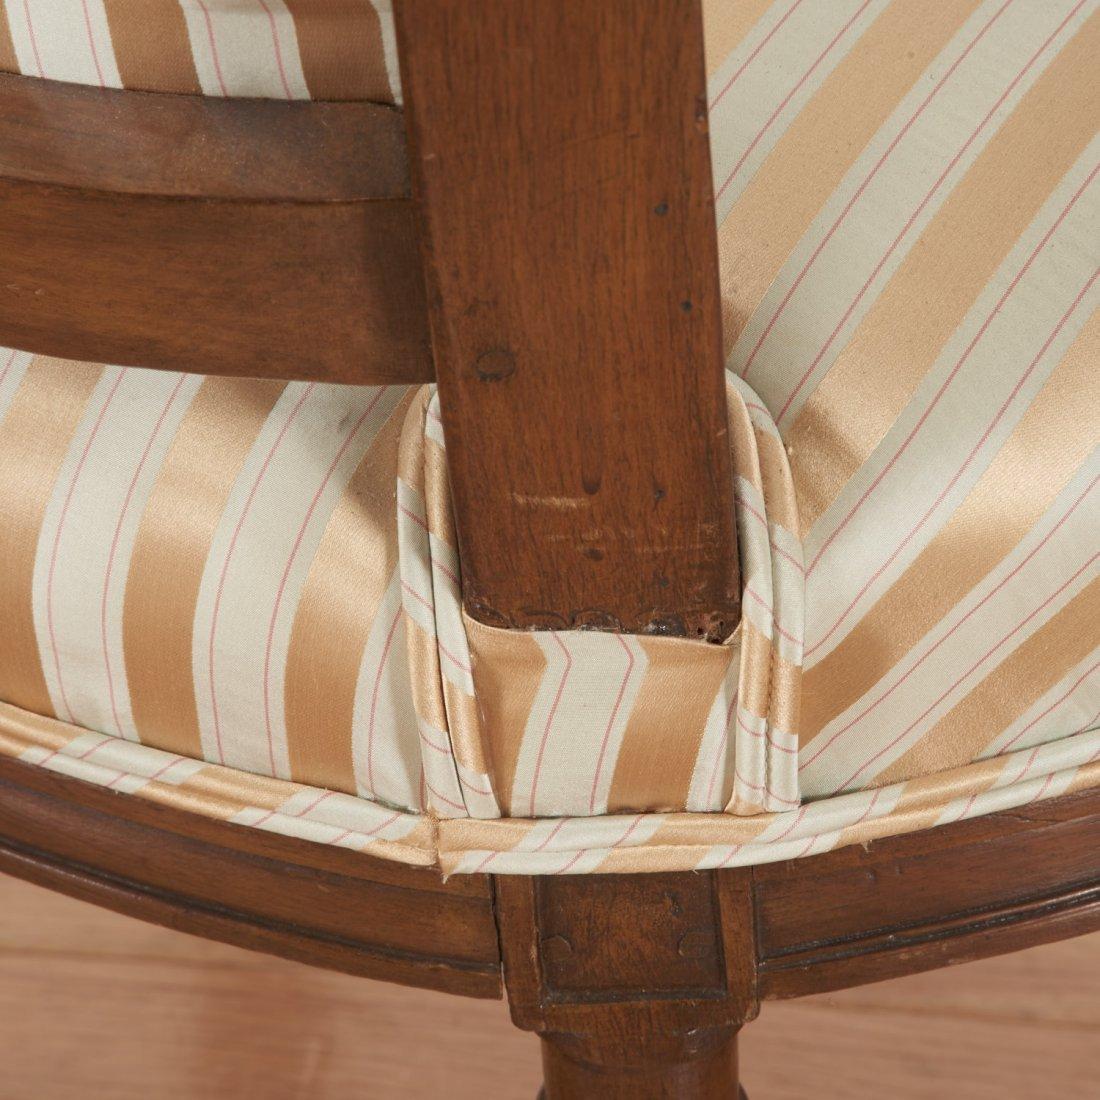 Pr Directoire silk upholstered mahogany fauteuils - 8